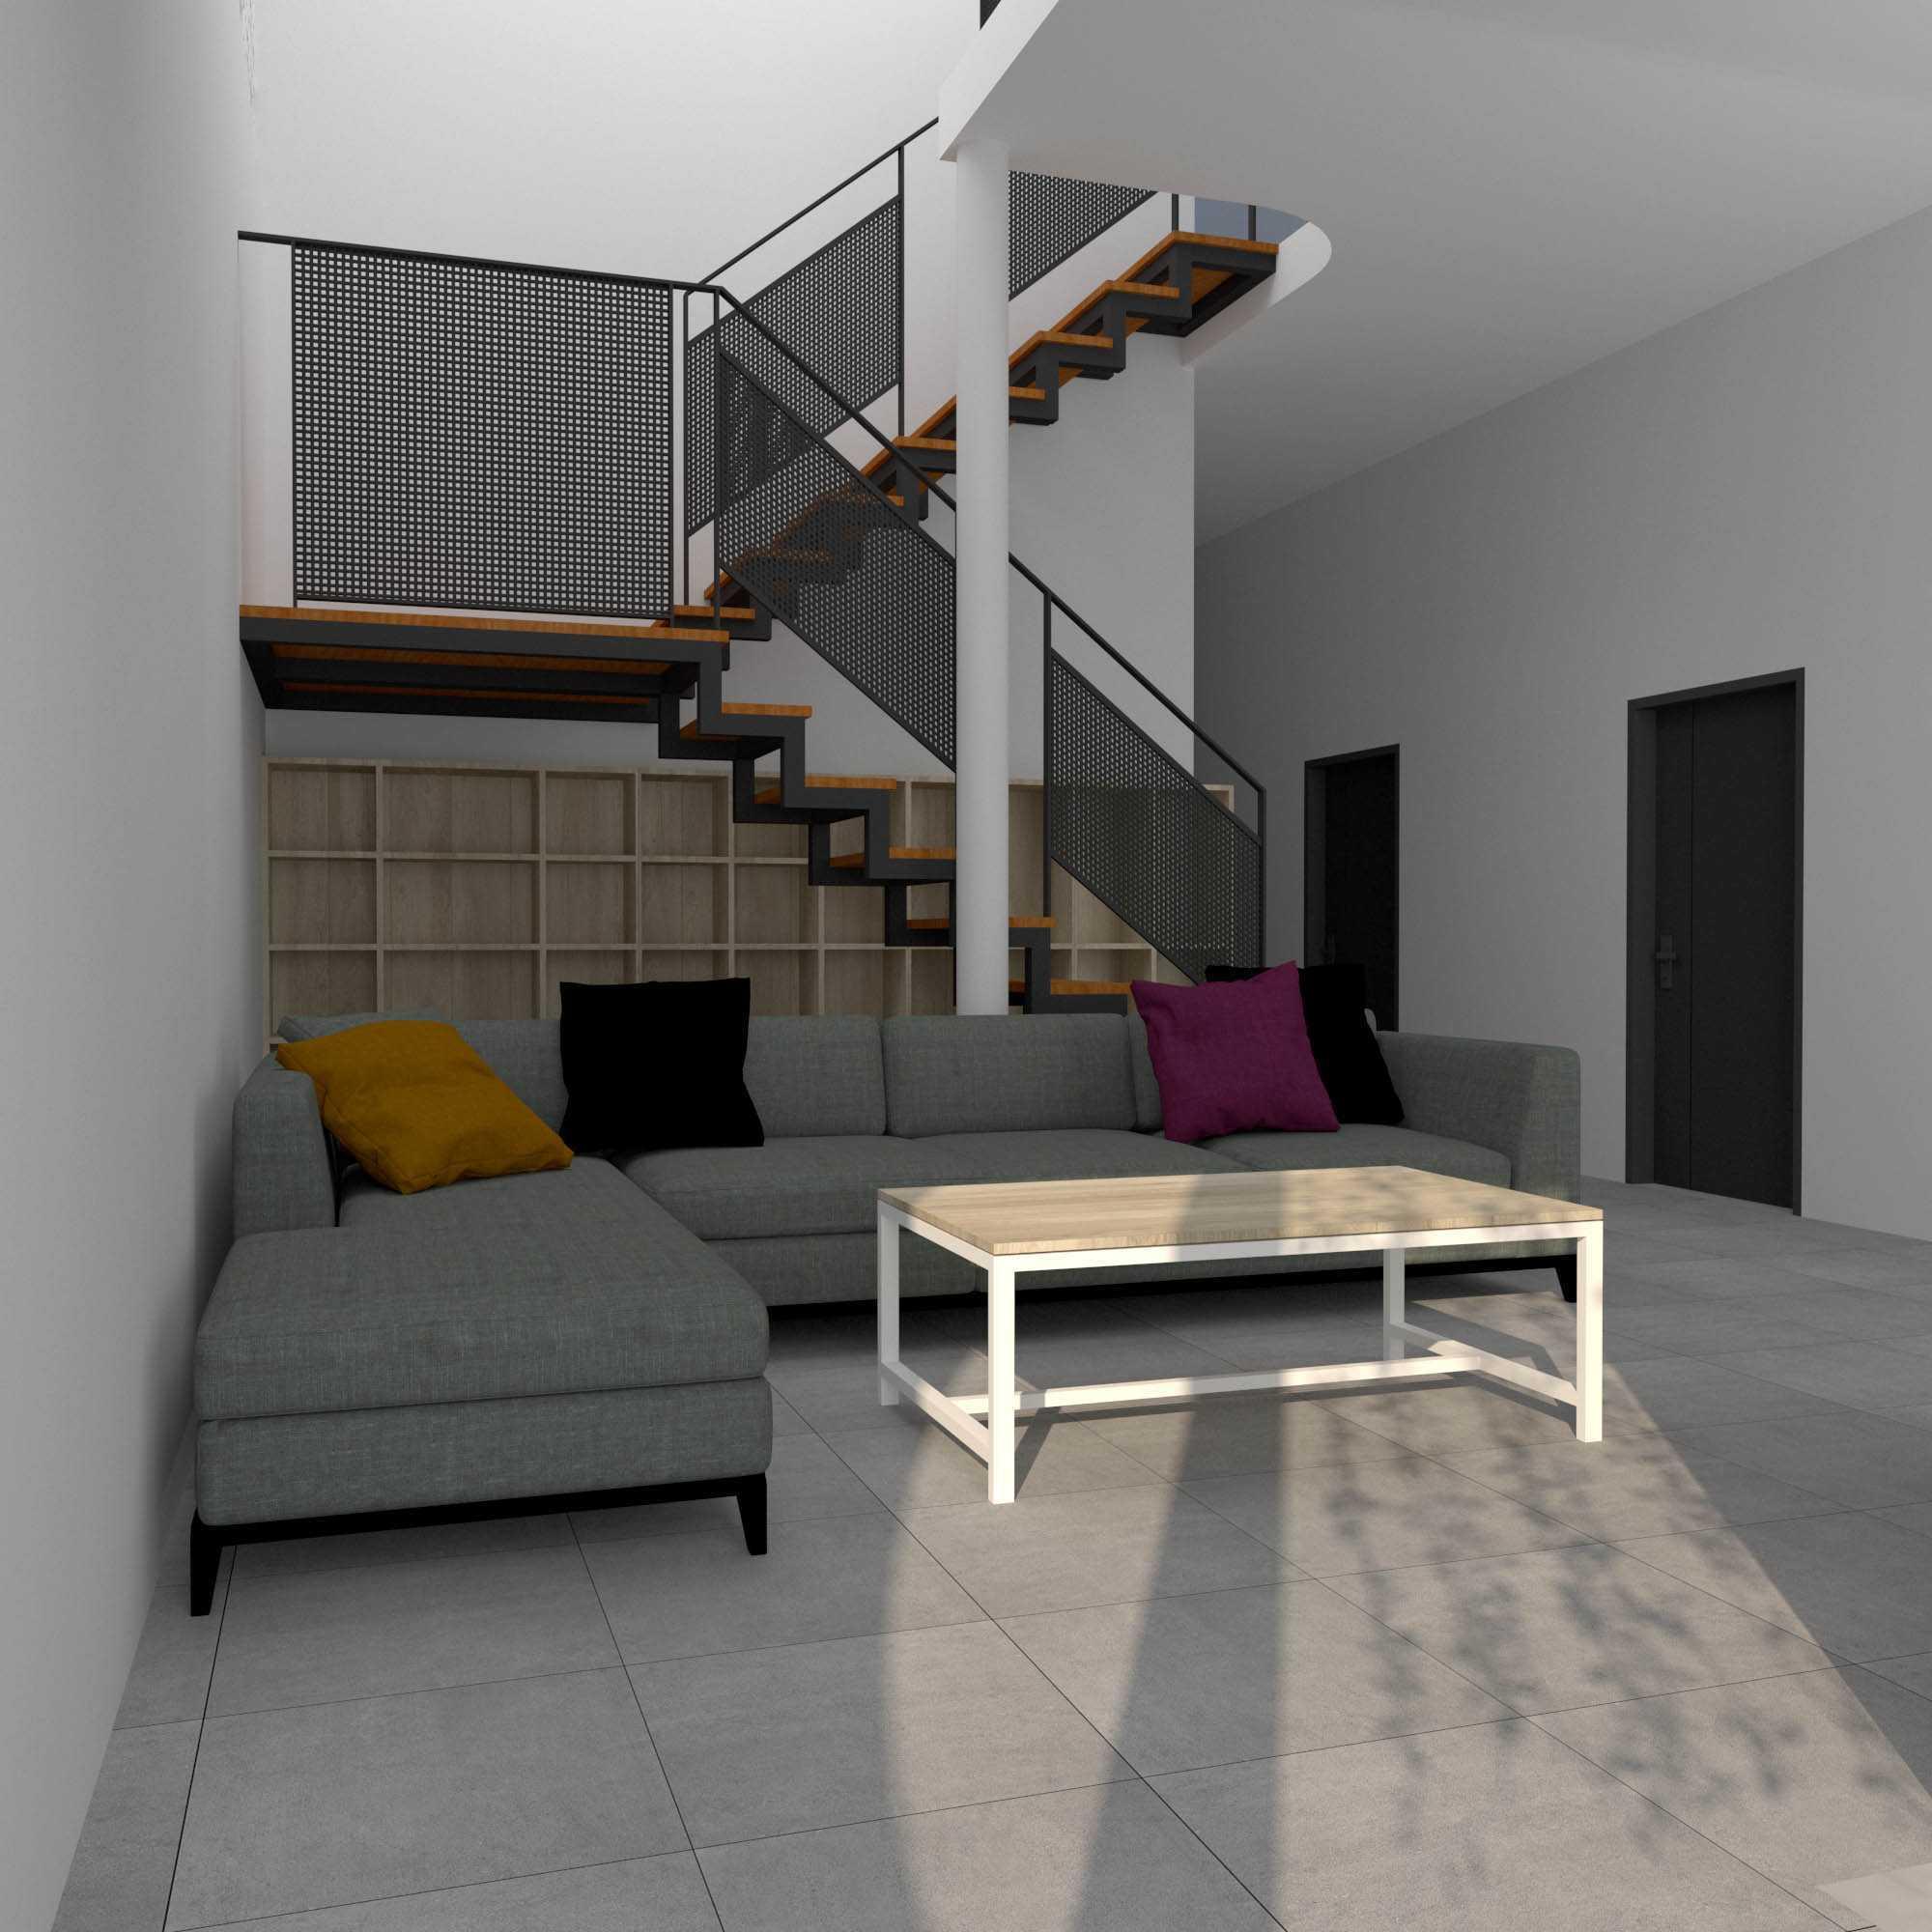 Inawa Arsitek Simple Boarding House Makassar, Kota Makassar, Sulawesi Selatan, Indonesia Makassar, Kota Makassar, Sulawesi Selatan, Indonesia Nasri-Architect-Associate-Simple-Boarding-House  90838